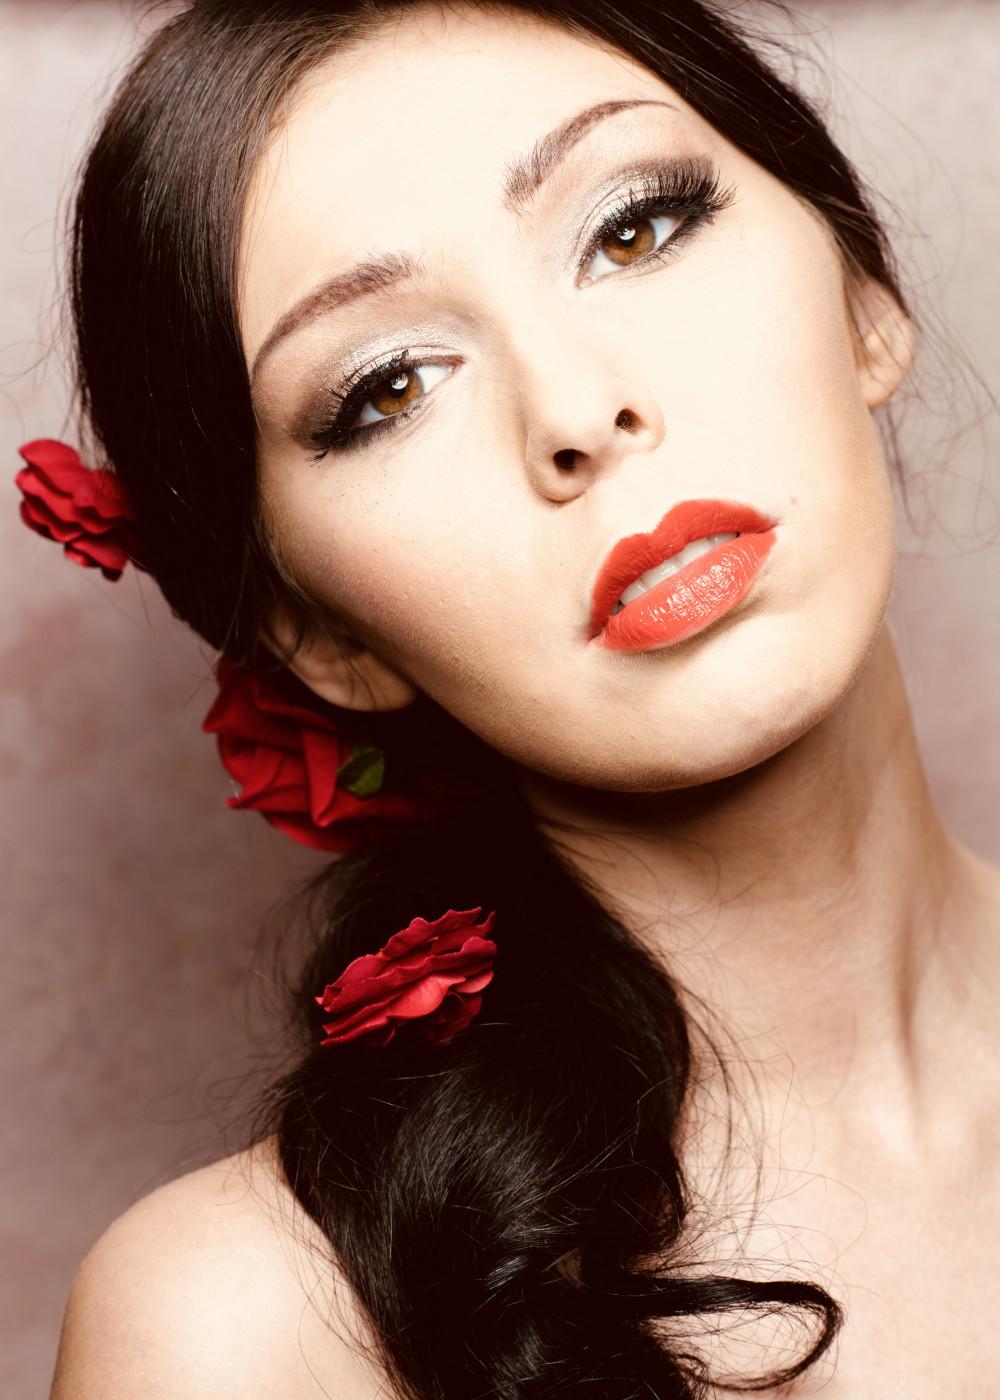 Glamorous latino style makeup - Make Me Bridal Artist: Martine Turner Hmua. #glamorous #redlipstick #latino